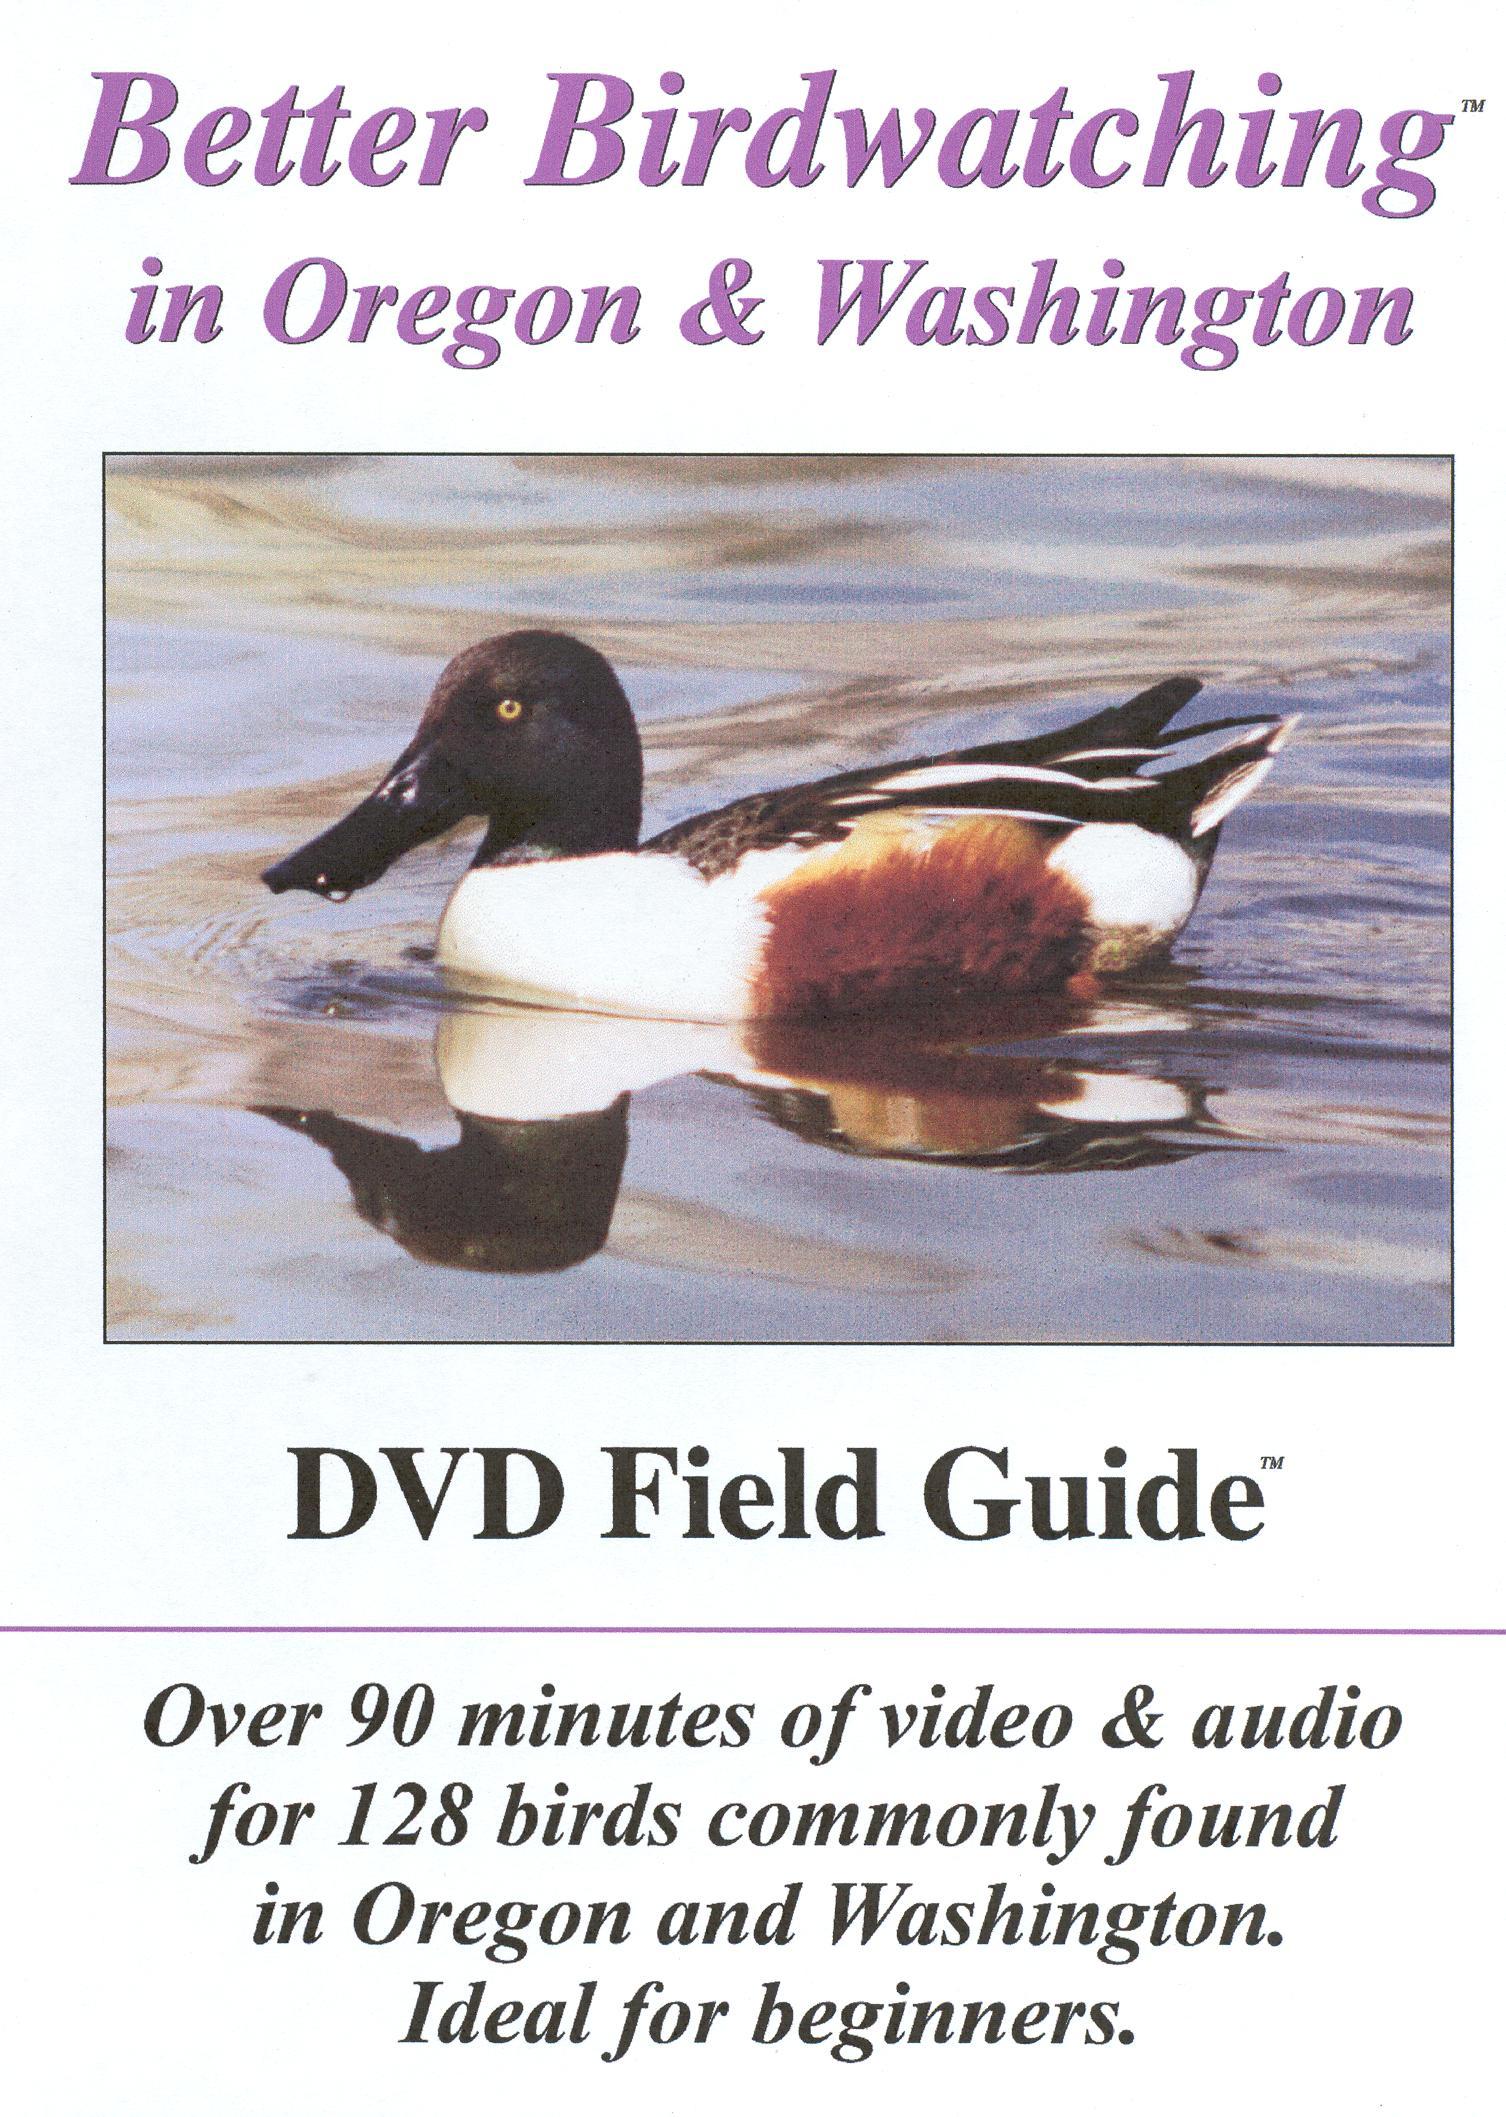 Better Birdwatching in Oregon and Washington